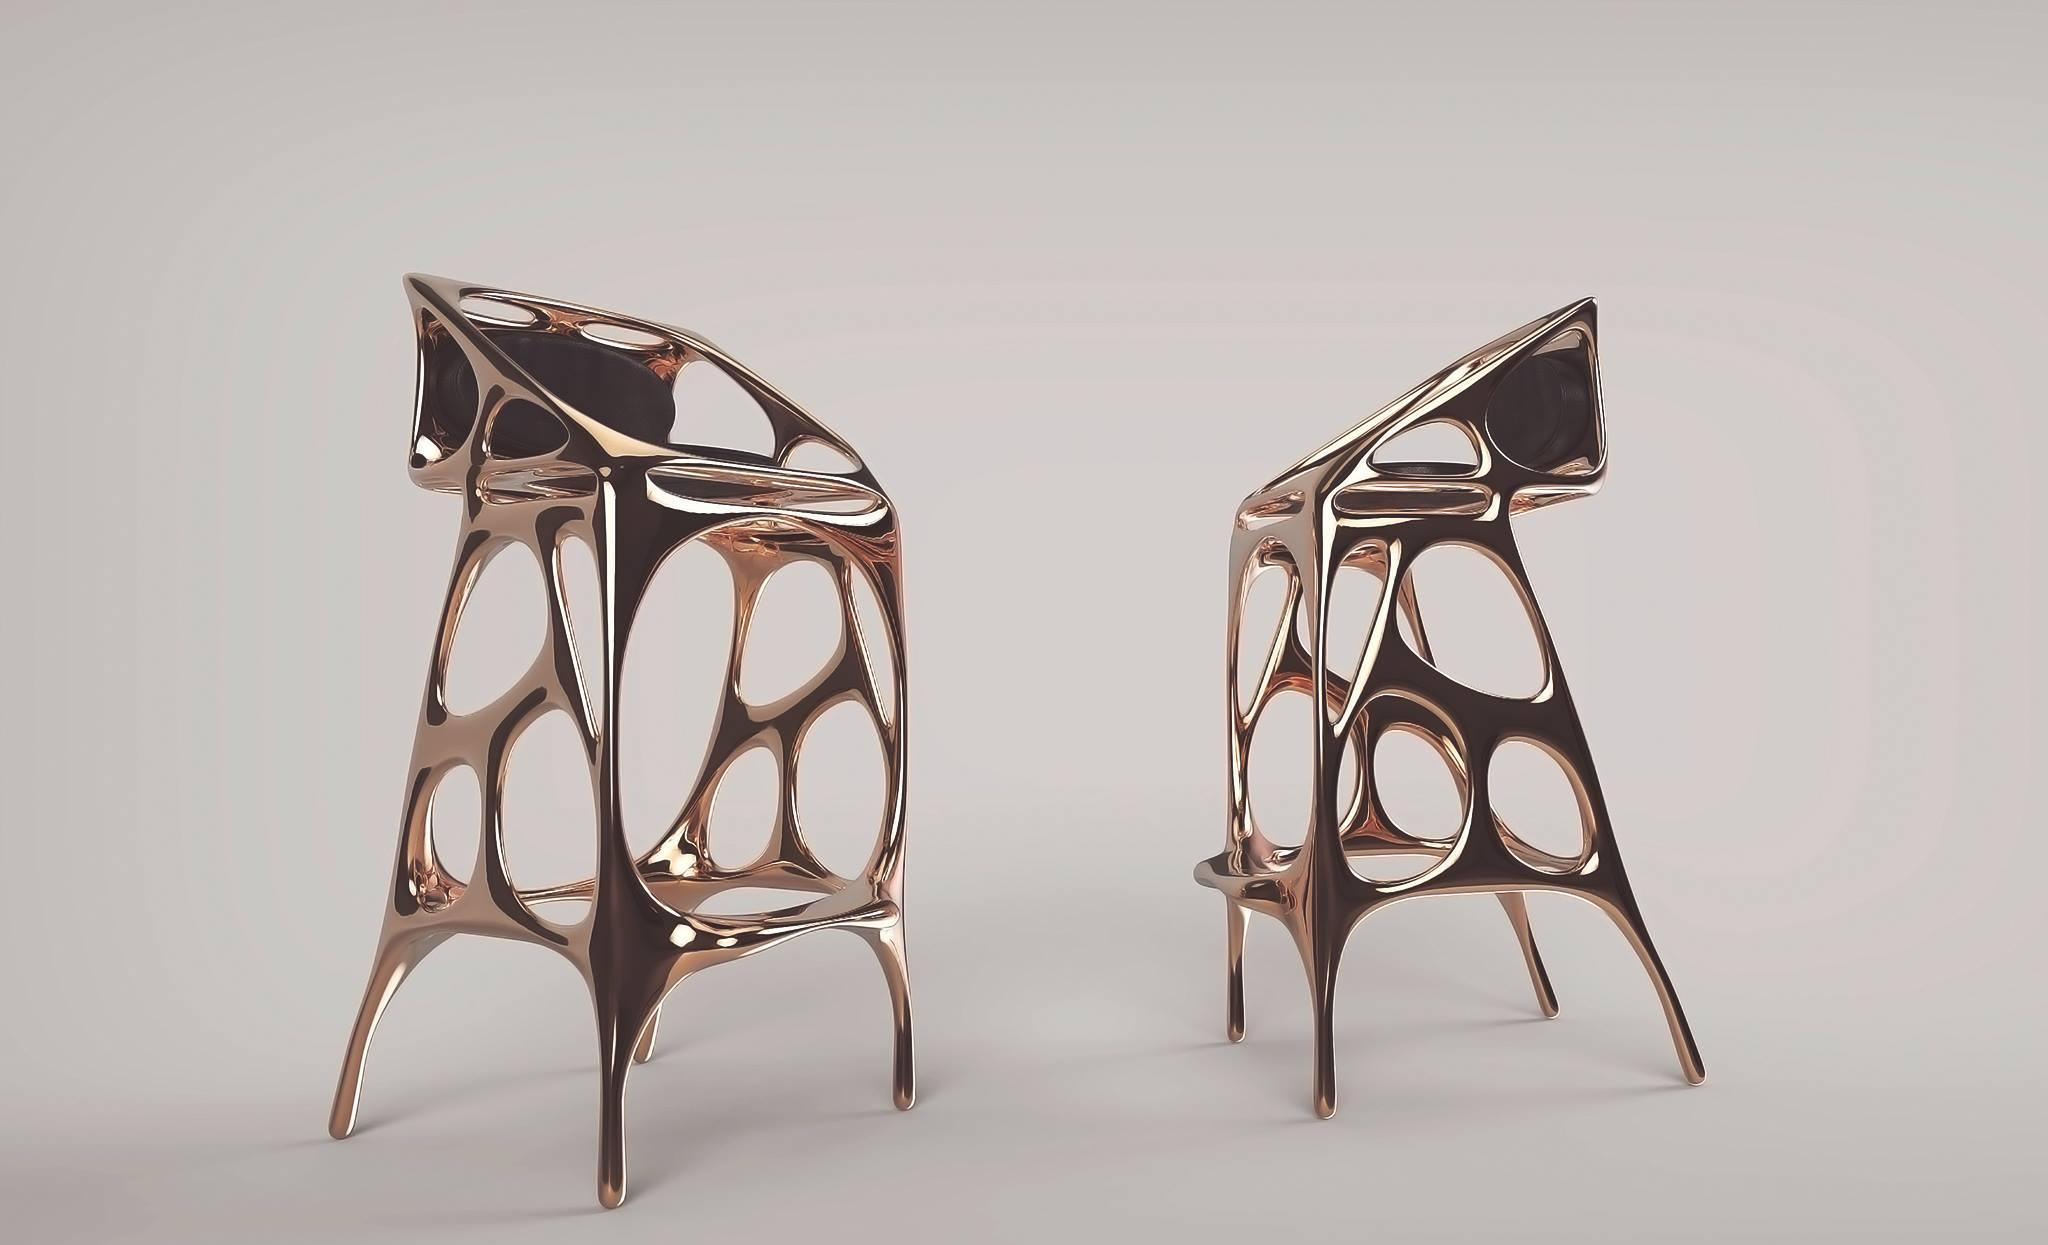 Maison Ventury Paris - designer Emmanuel Touraine  more info here